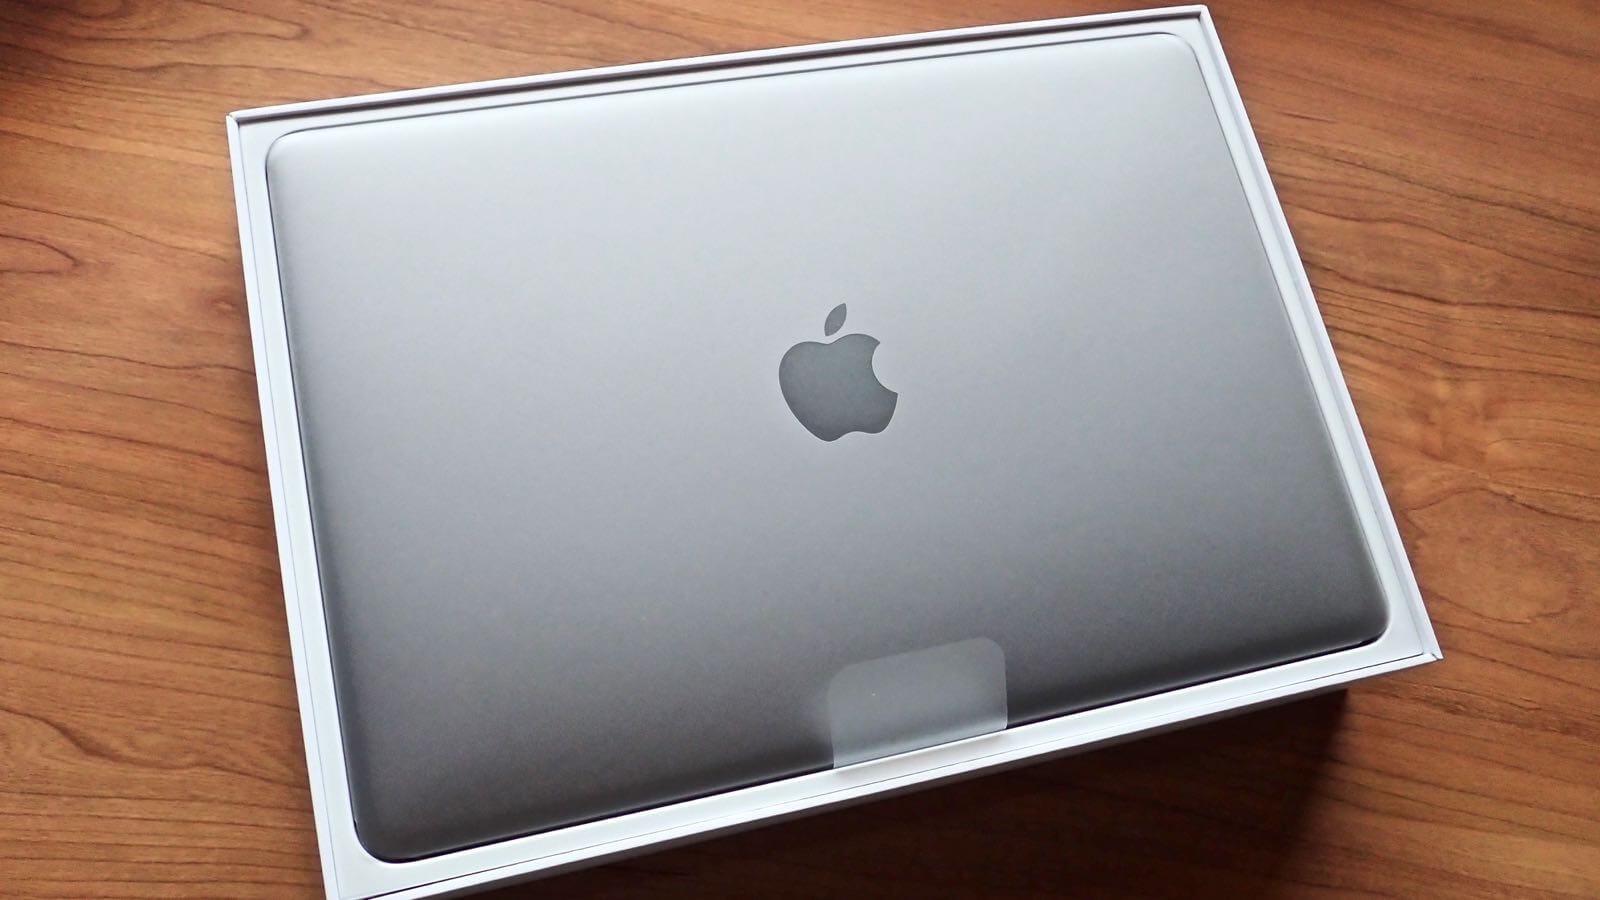 0202 Apple maintenance item Quality MacBook 2017 12inch 007